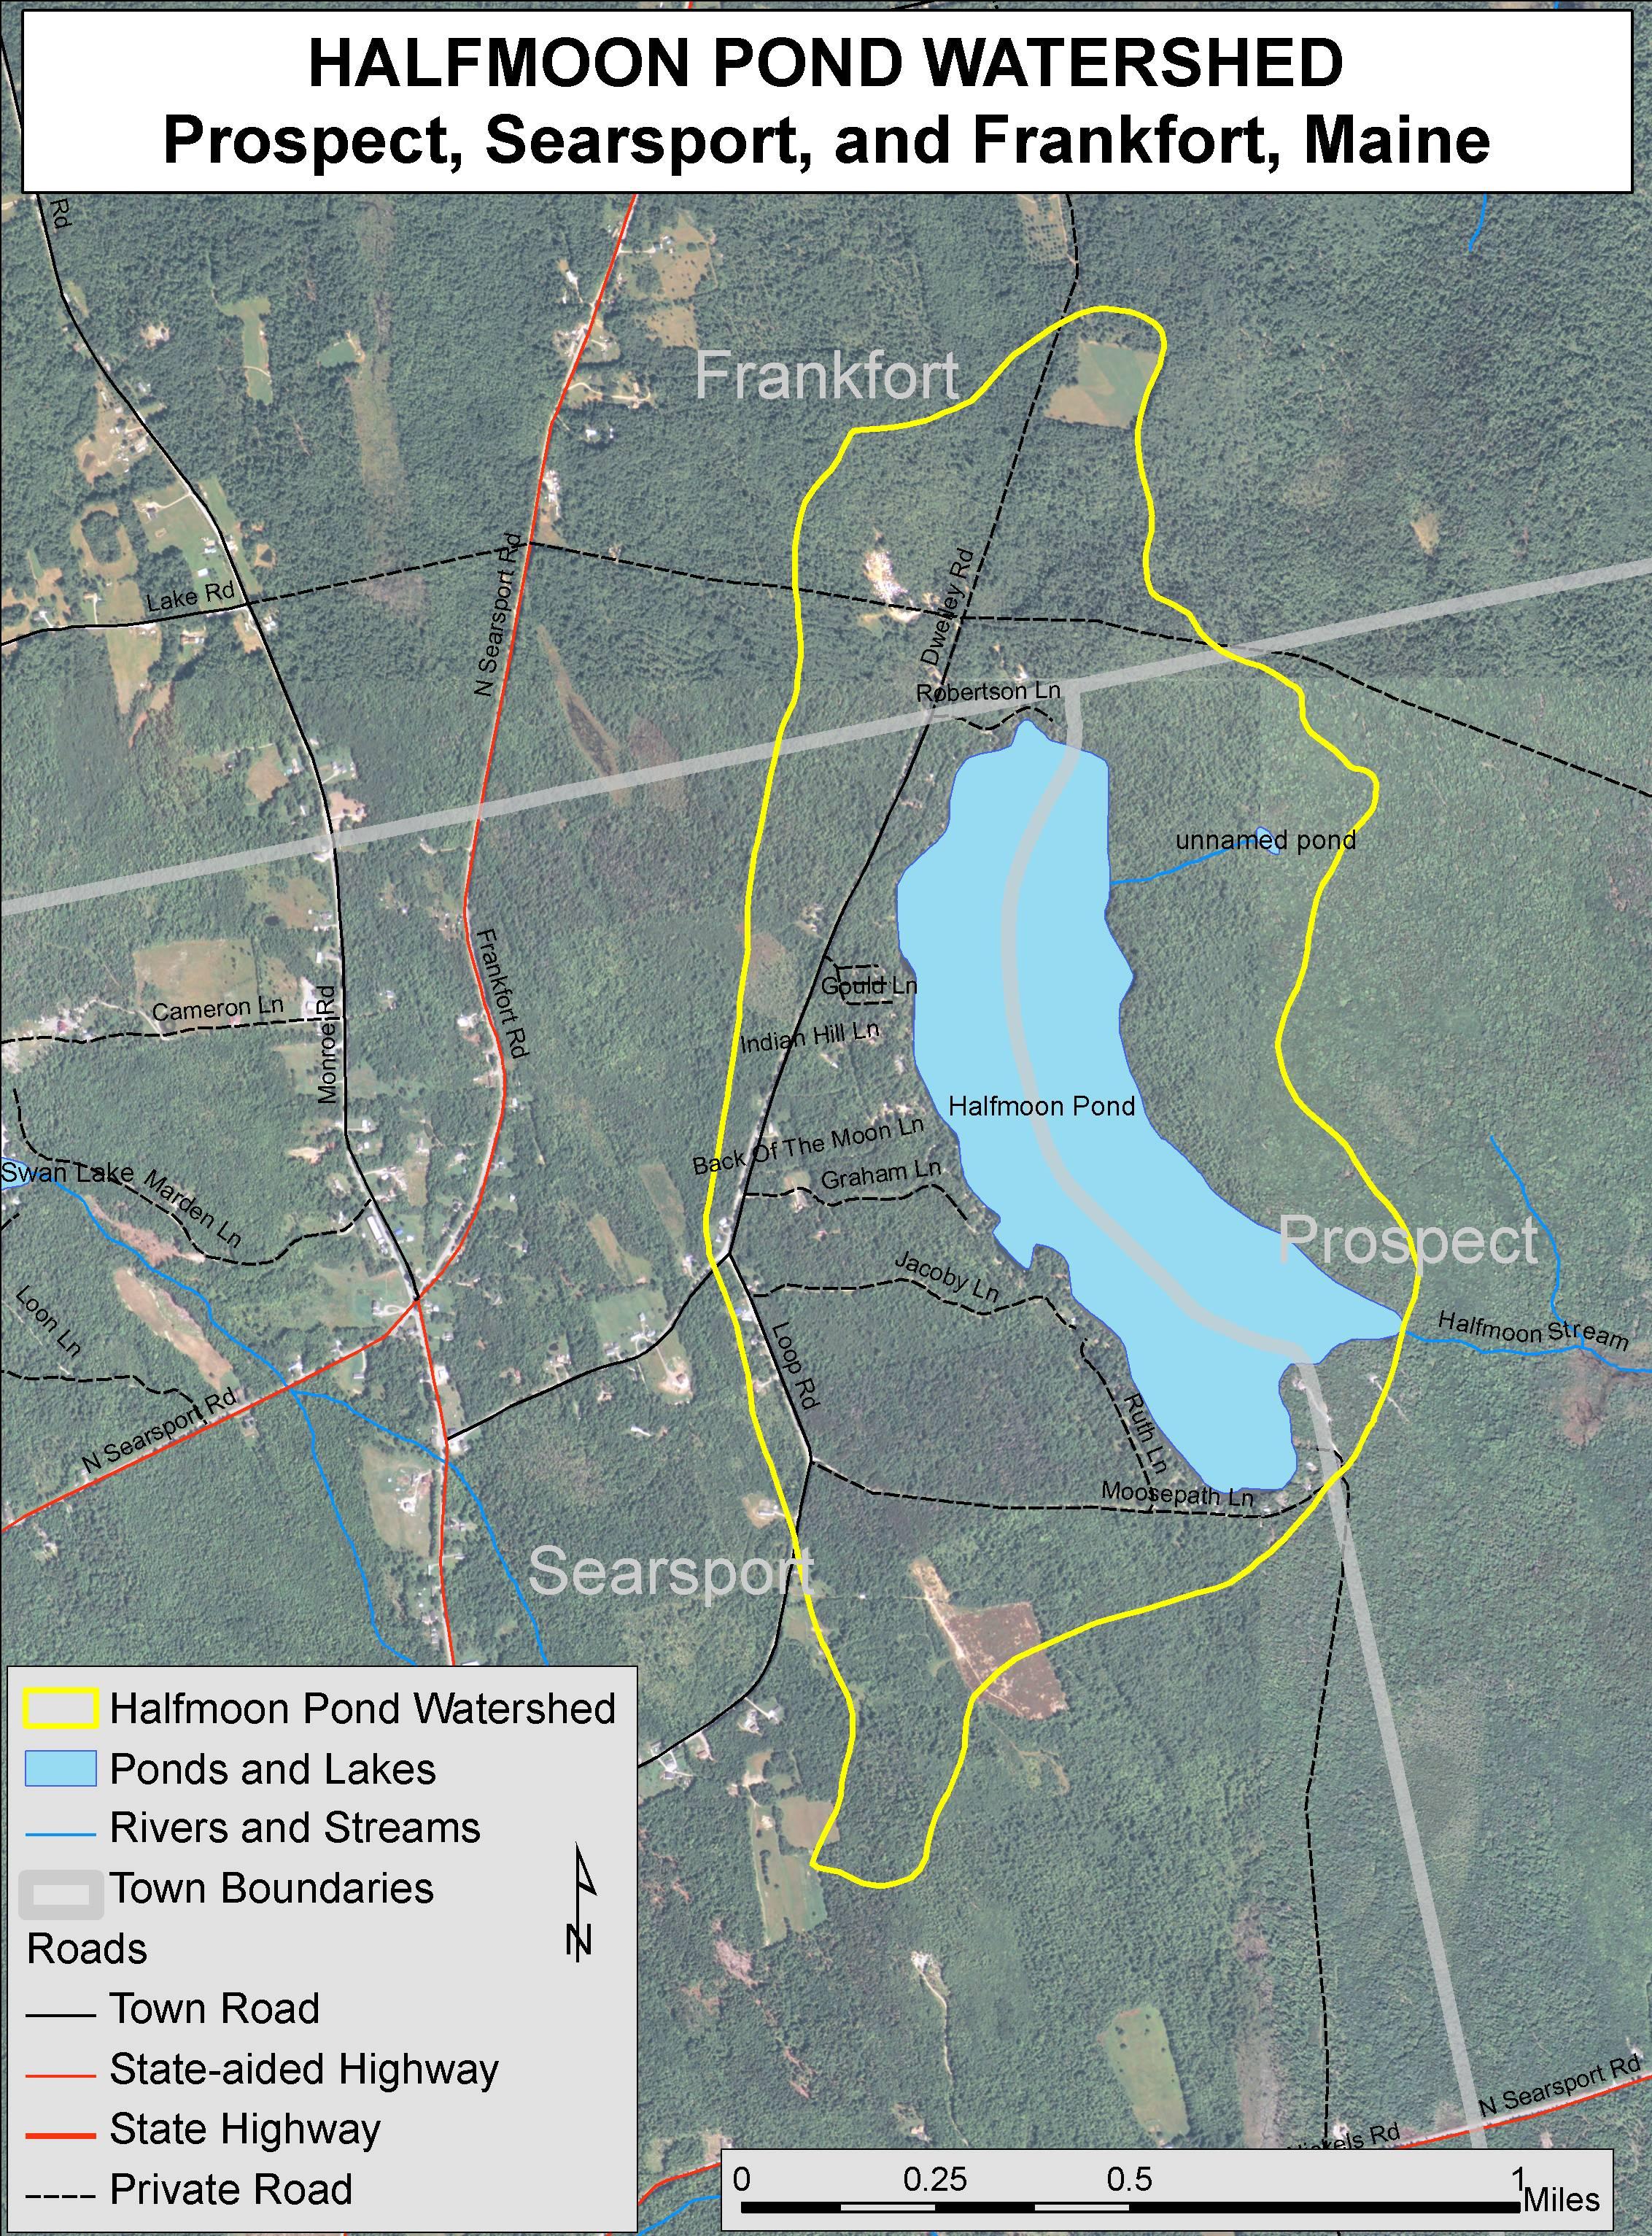 Lakes of Maine - Lake Overview - Halfmoon Pond - Prospect ... on arlington maine map, katahdin maine map, fairfield maine on map, swan's island maine map, bangor maine map, jonesport maine map, maine maine map, wilmington maine map, maine hardiness zone map, camden maine map, belfast maine map, maine blueberry map, warren maine map, brewer lake maine map, ogunquit maine map, dedham maine map, dixfield maine map, yarmouth maine map, cape jellison maine map, bath maine map,